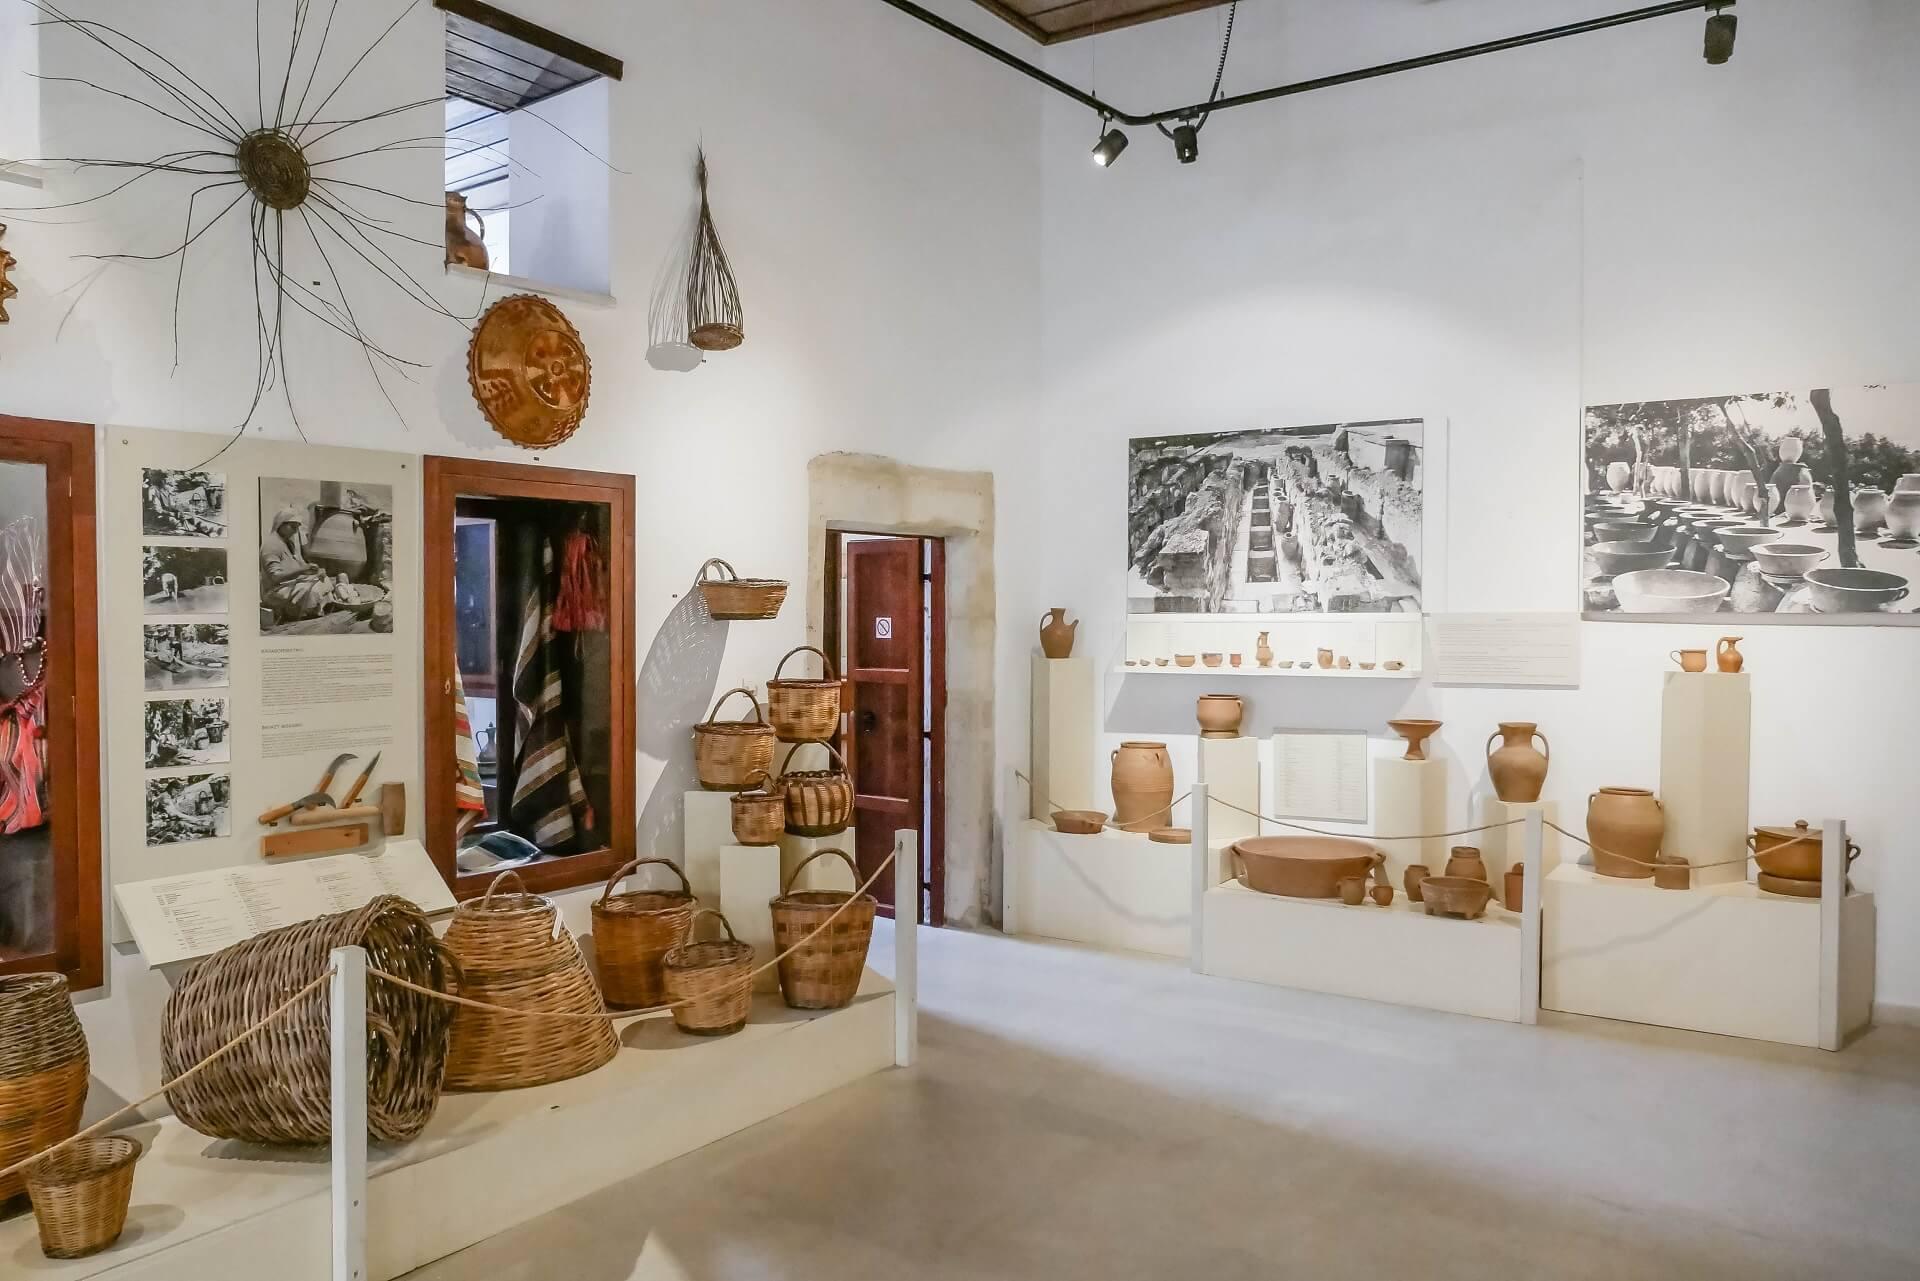 Rethymno museum